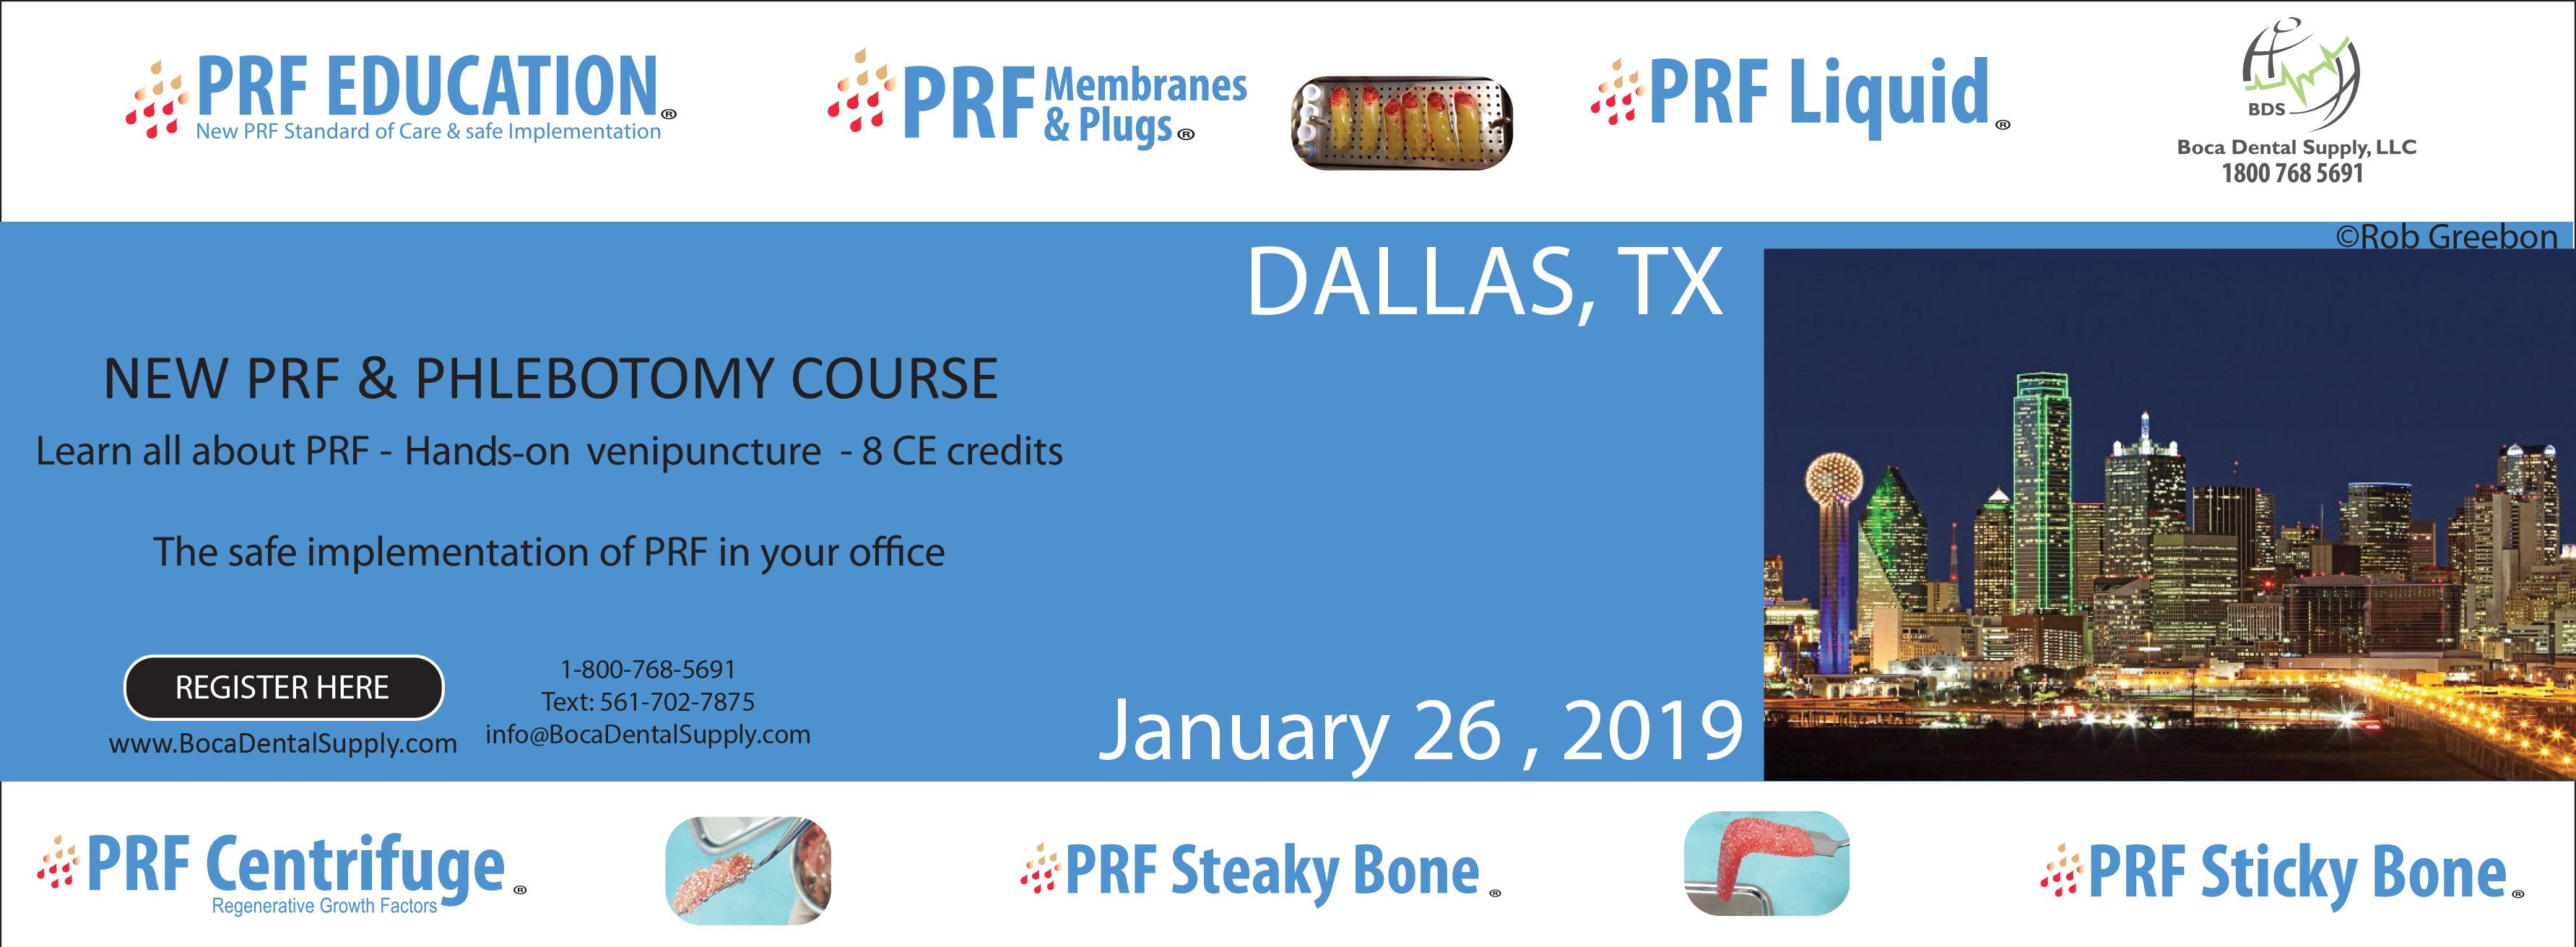 prf-course-dallas-tx-2019-2.jpg